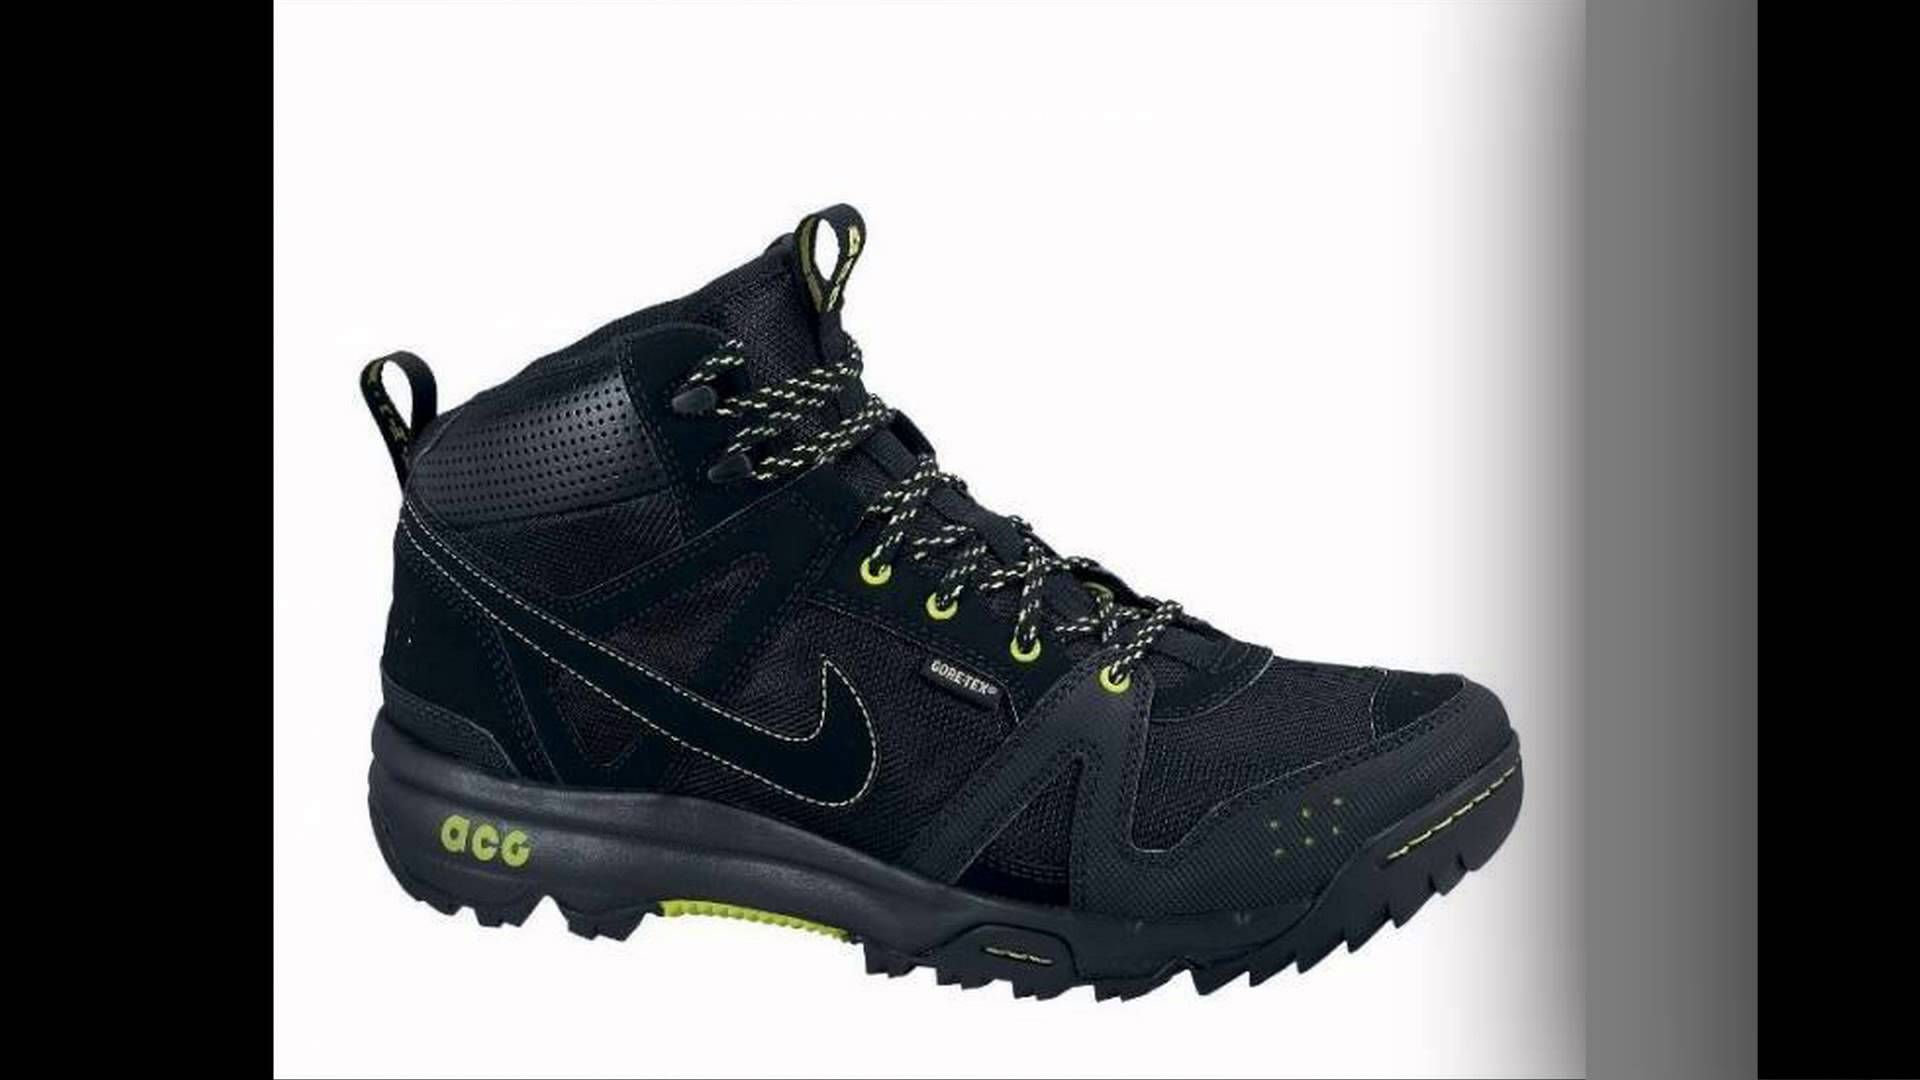 adidas nike trekking botlar http://www.korayspor.com/Trekking-Bot-Ve-Ayakkabilari